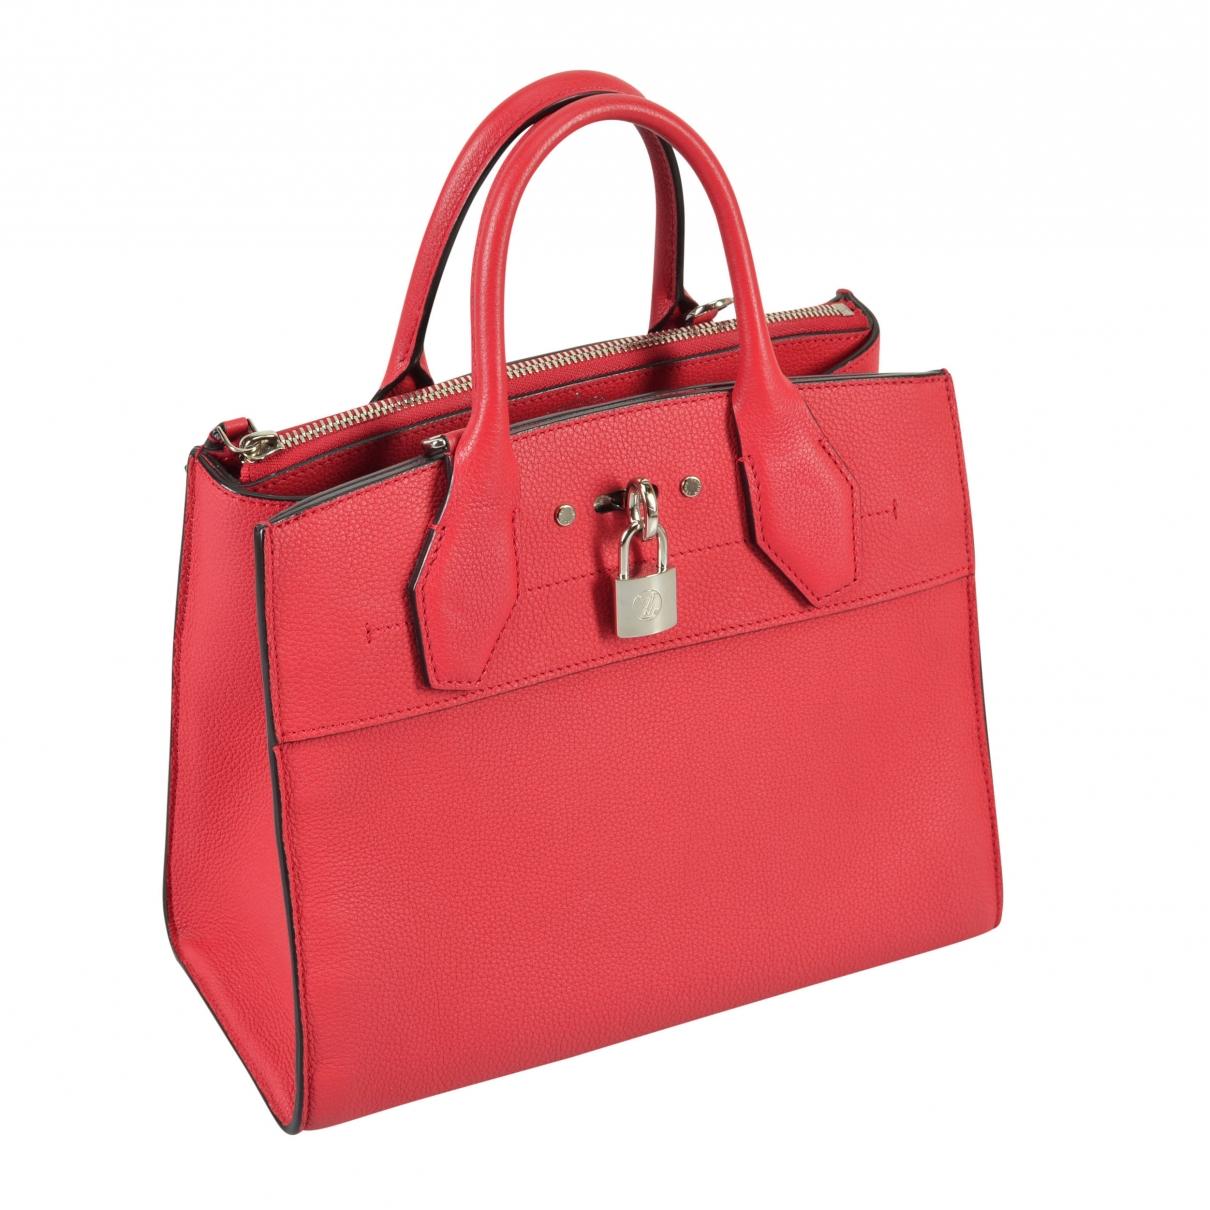 Louis Vuitton City Steamer Red Leather handbag for Women \N